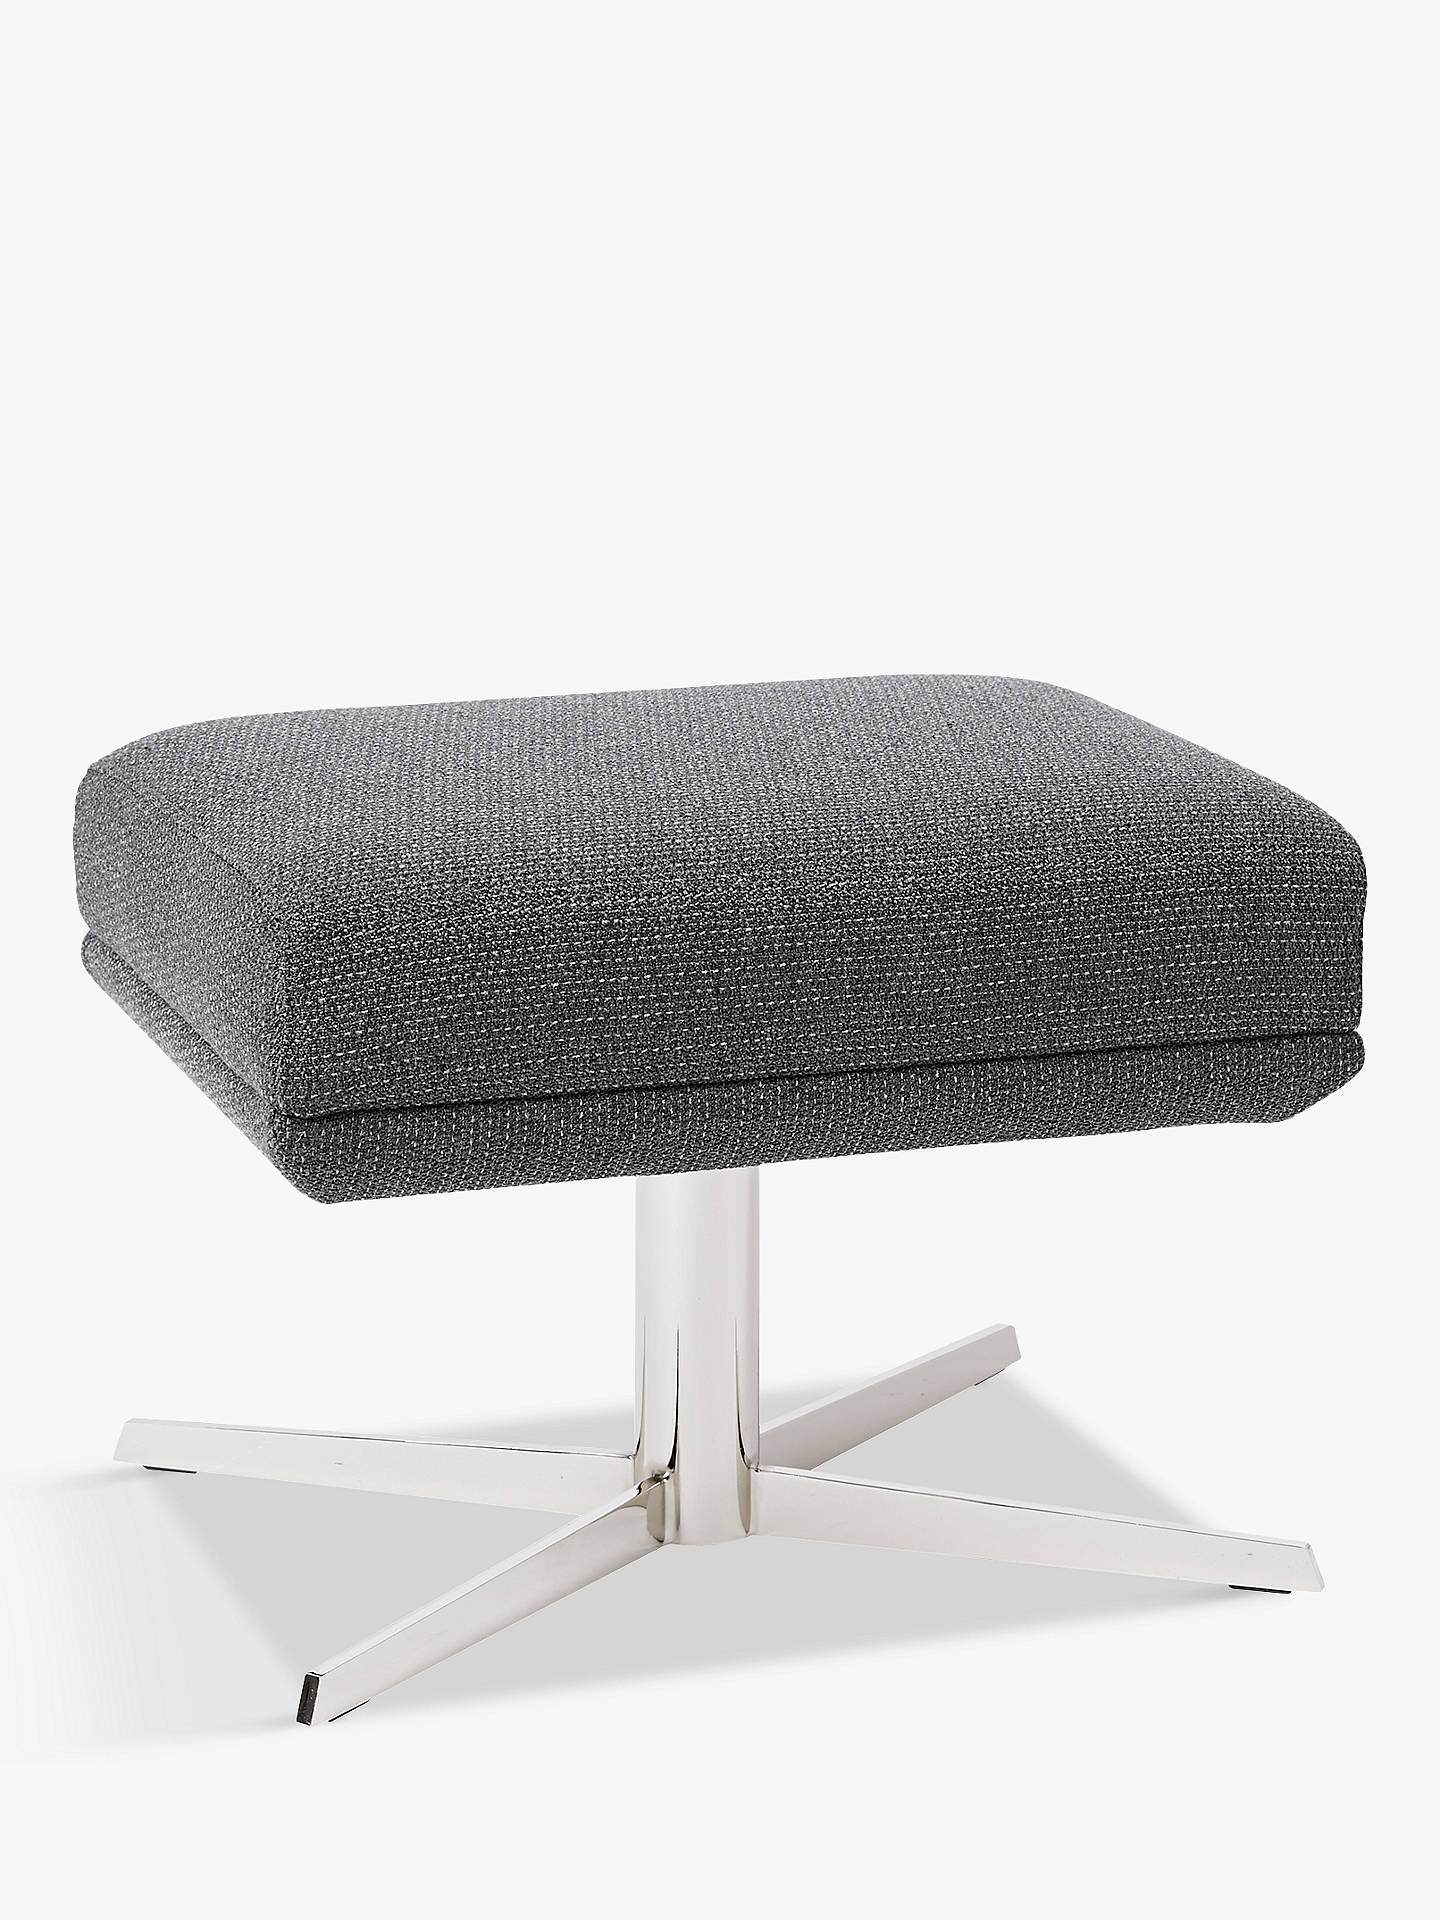 Terrific West Elm Austin Swivel Ottoman Mod Weave Grey Theyellowbook Wood Chair Design Ideas Theyellowbookinfo